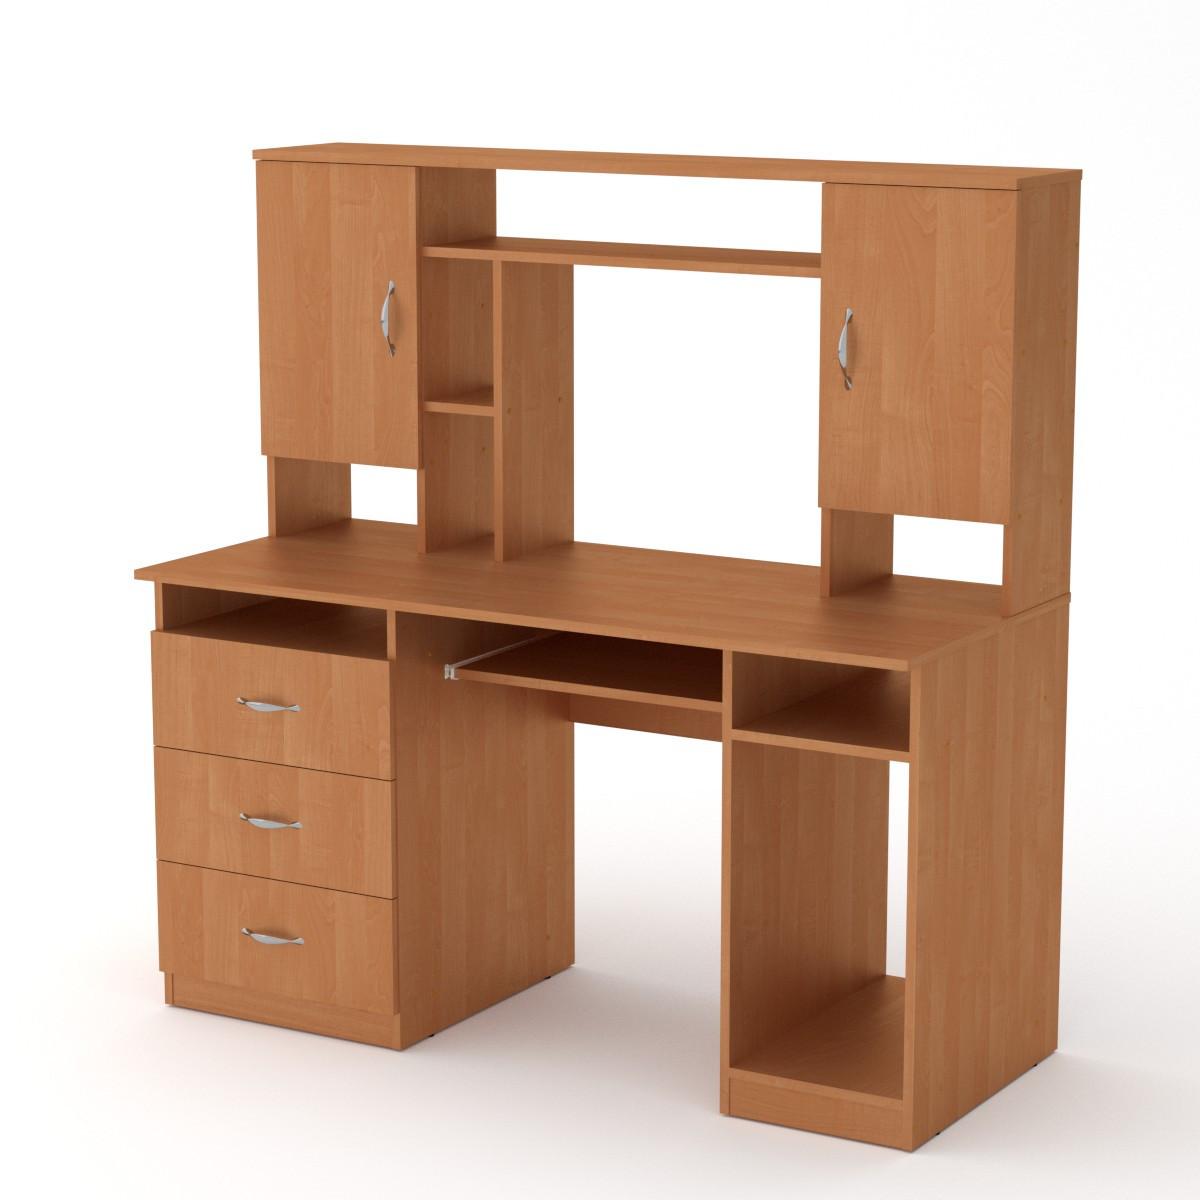 Стол компьютерный менеджер ольха Компанит (140х60х142 см)